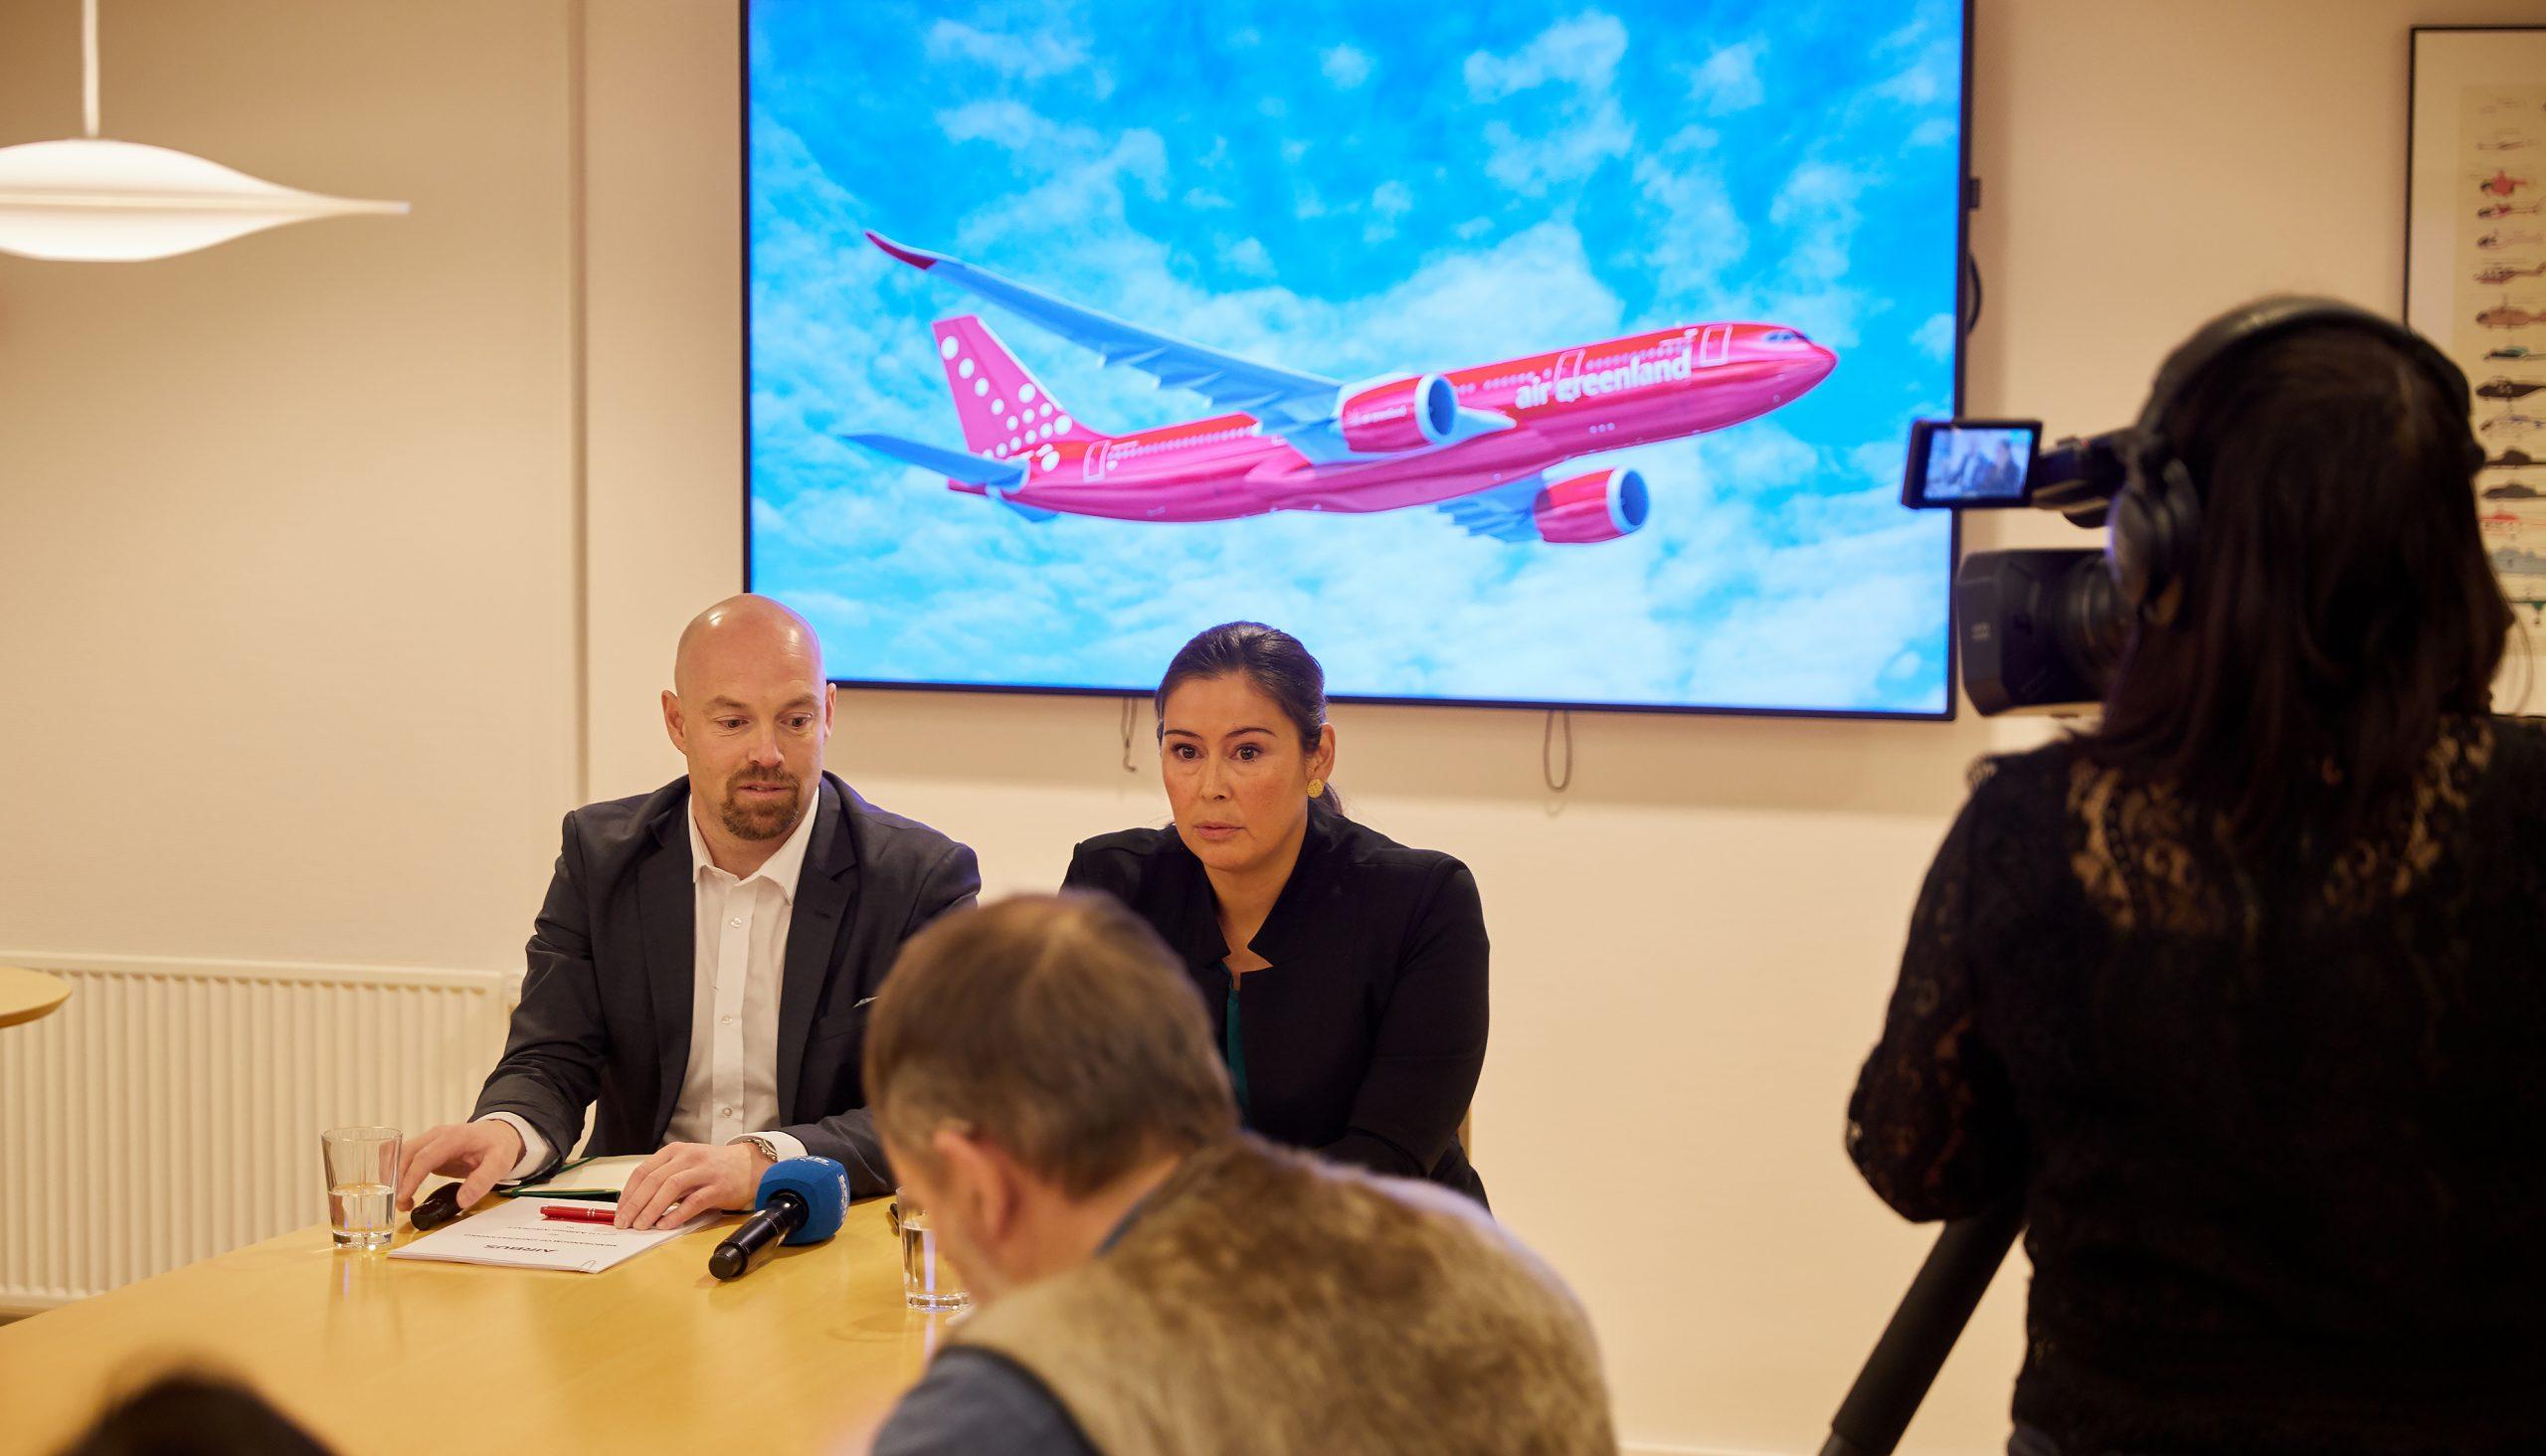 Adm. direktør Jacob Nitter Sørensen og bestyrelsesformand Bodil Marie Damgaard fra Air Greenland fra kontraktunderskrivelsen. (Foto: Air Greenland   PR)